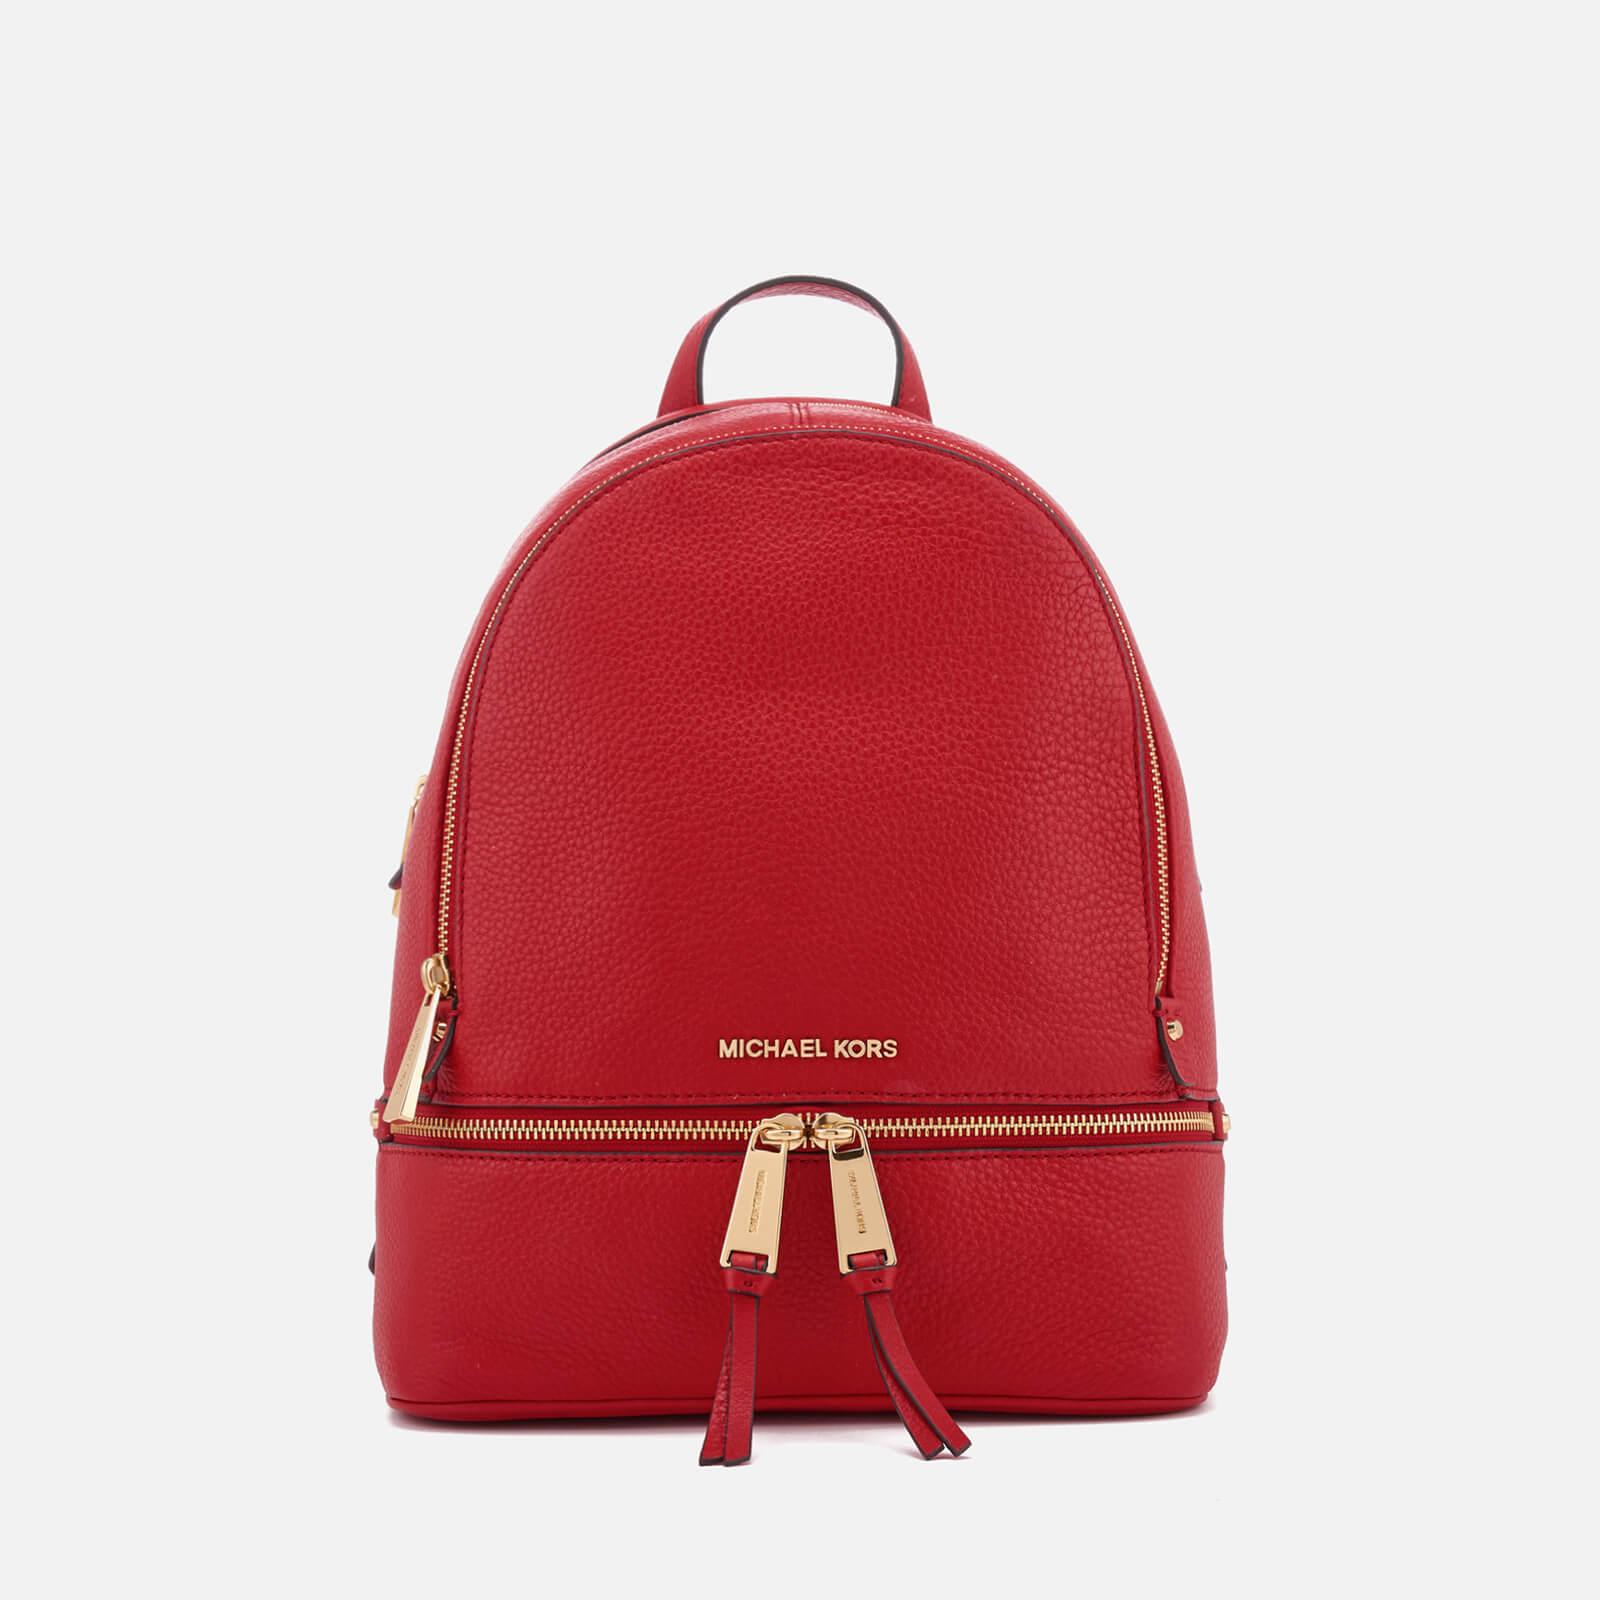 f4119fc7cc66 ... MICHAEL MICHAEL KORS Women's Rhea Zip Medium Backpack - Bright Red